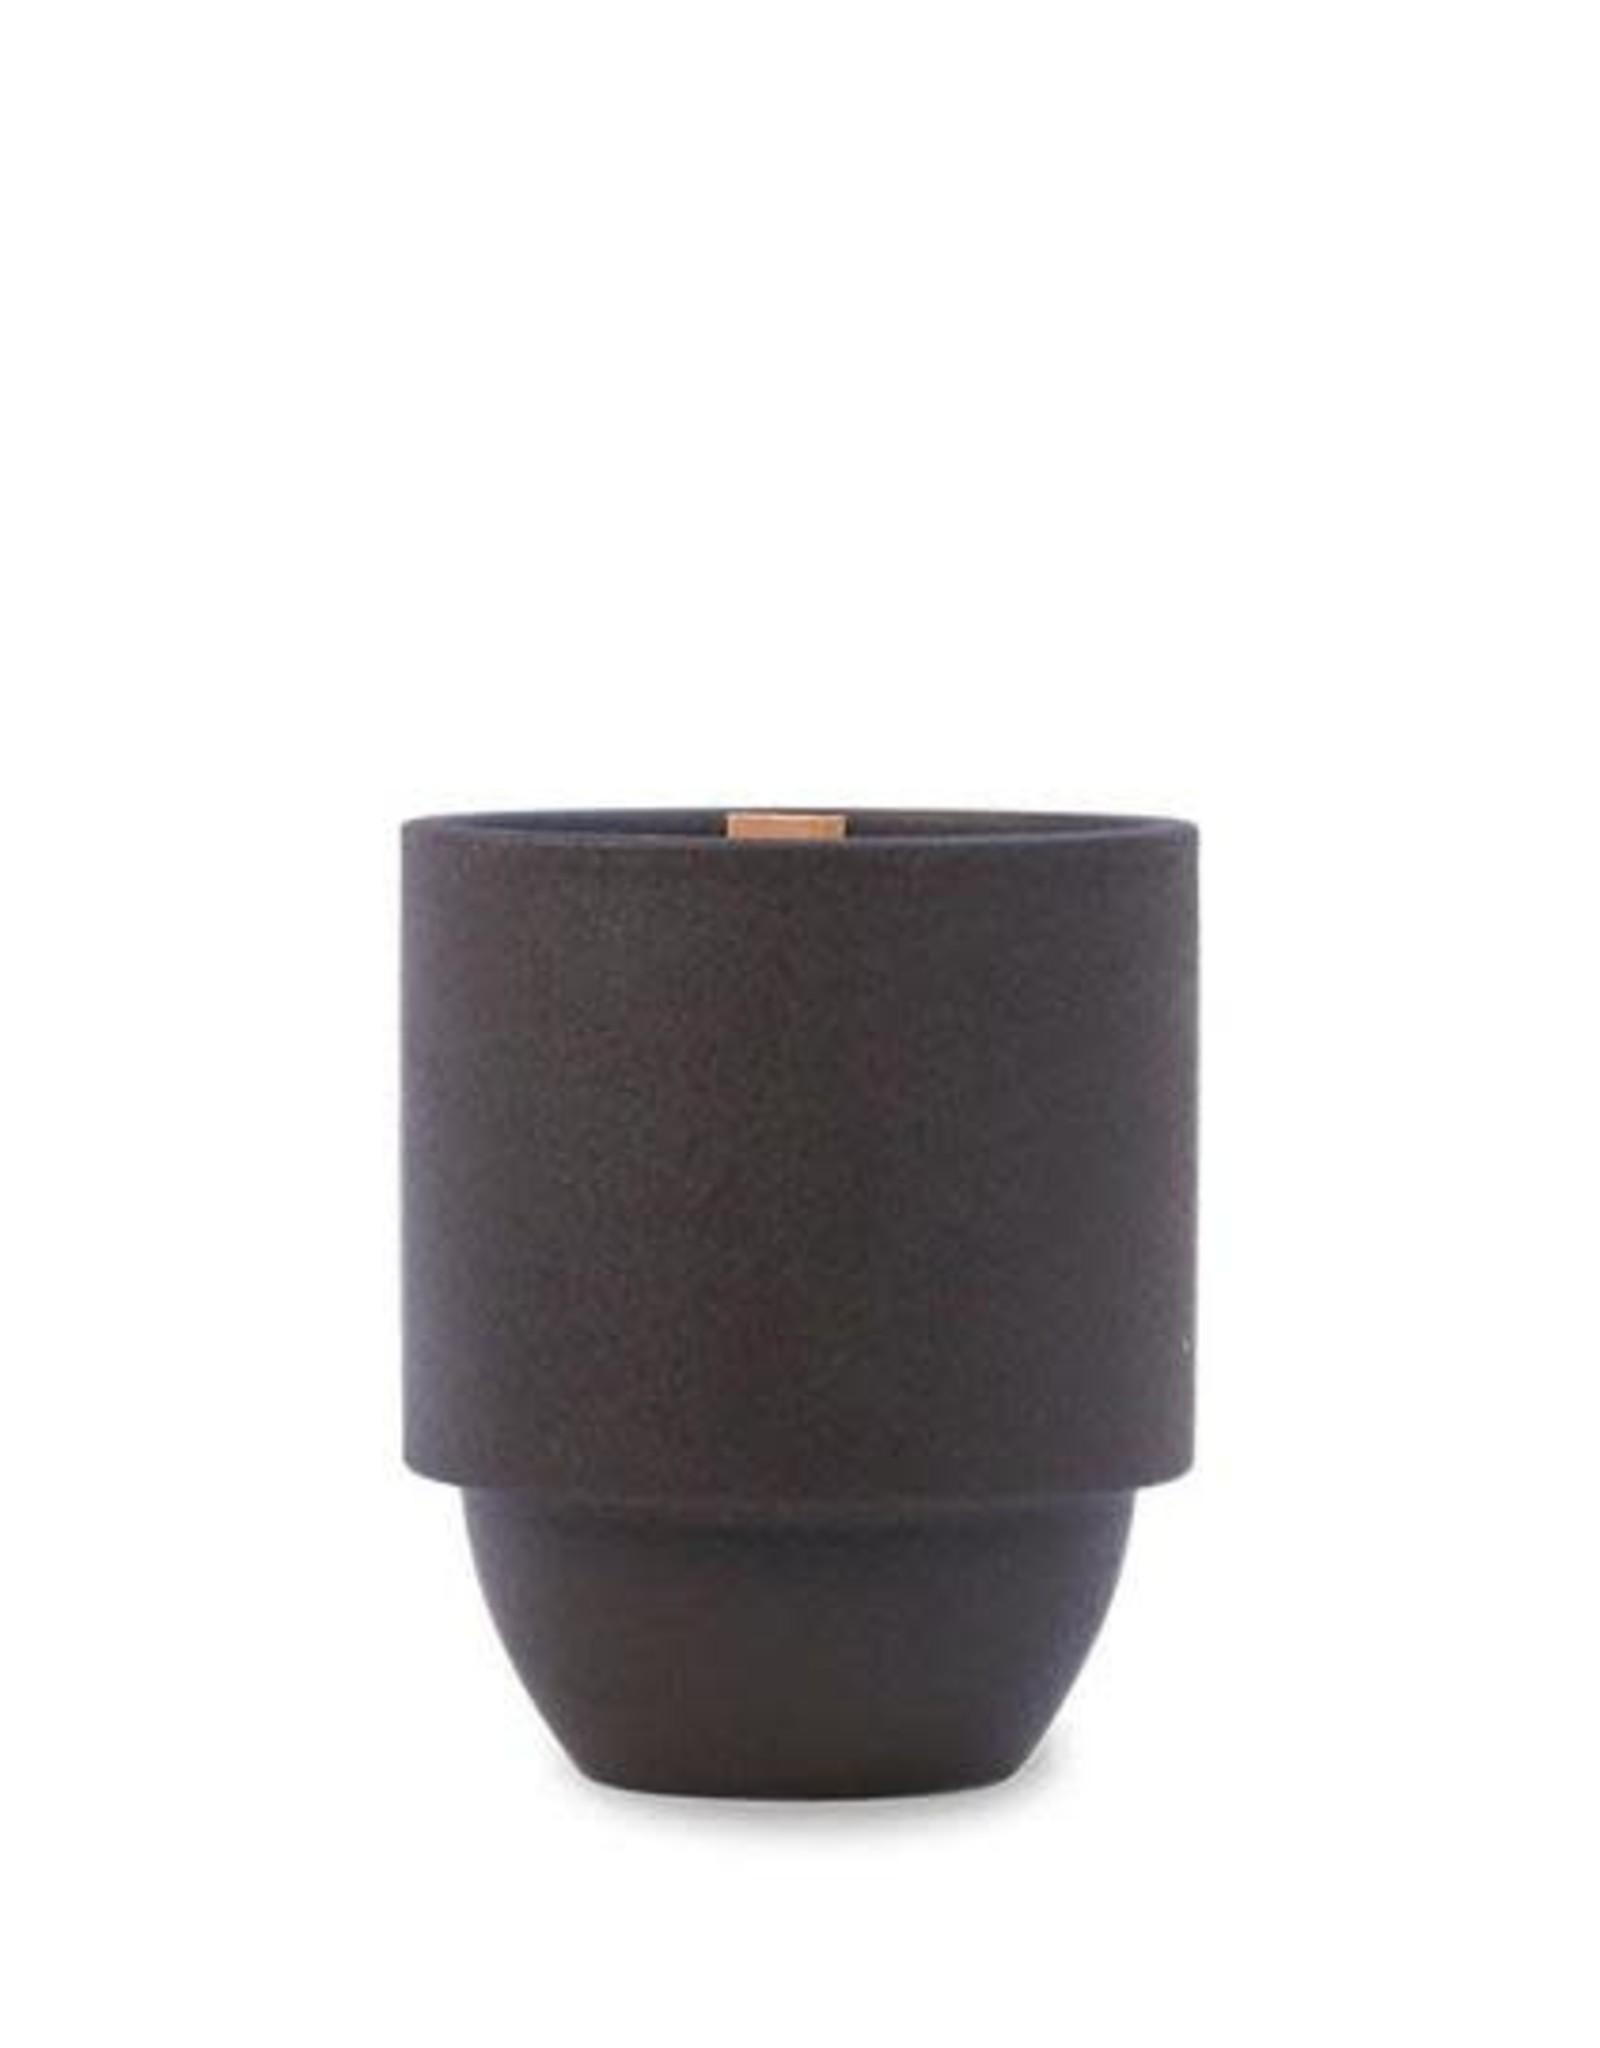 Paddywax Cottonwood + Oak Candle 11oz